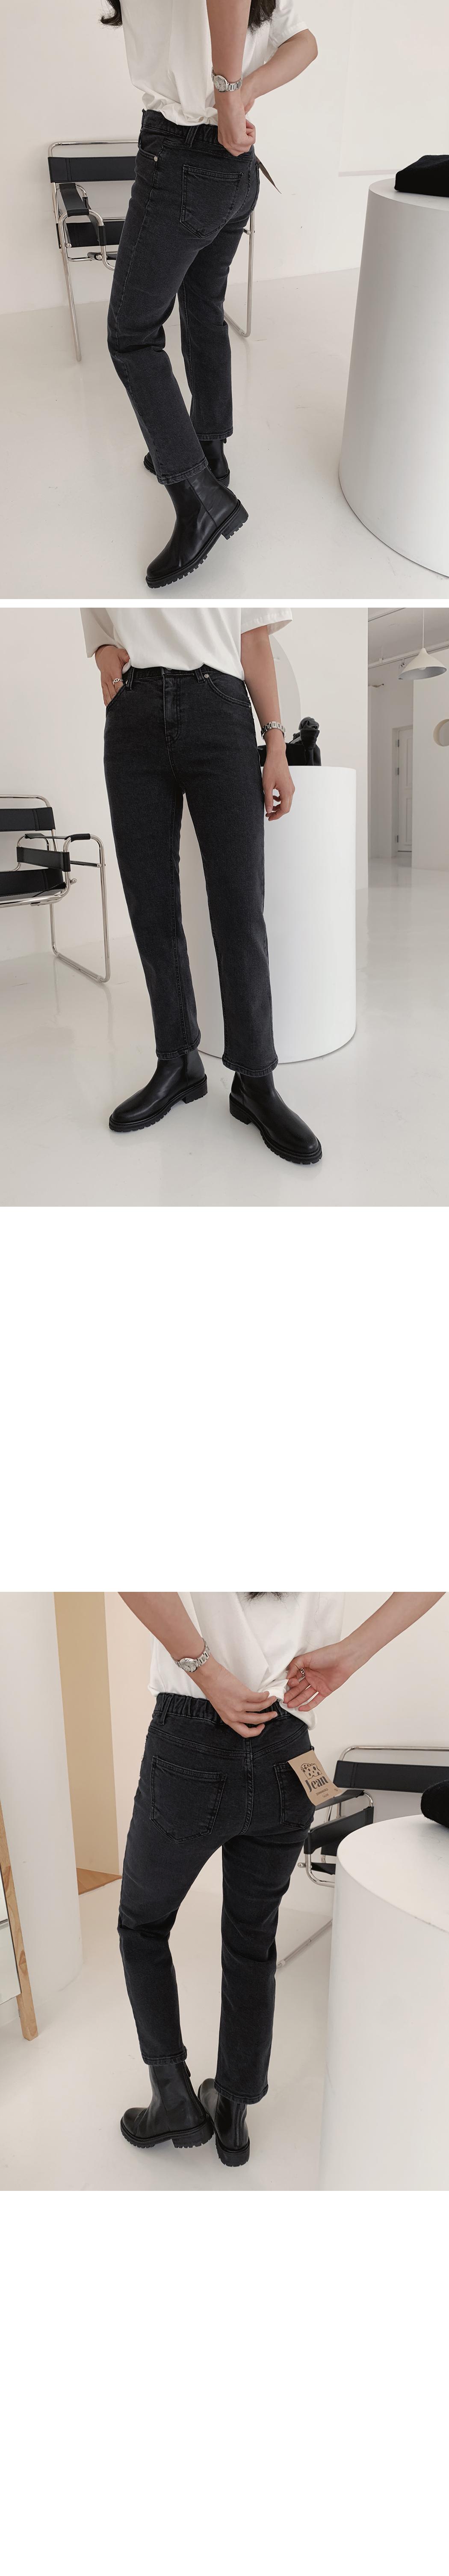 Platform worker boots